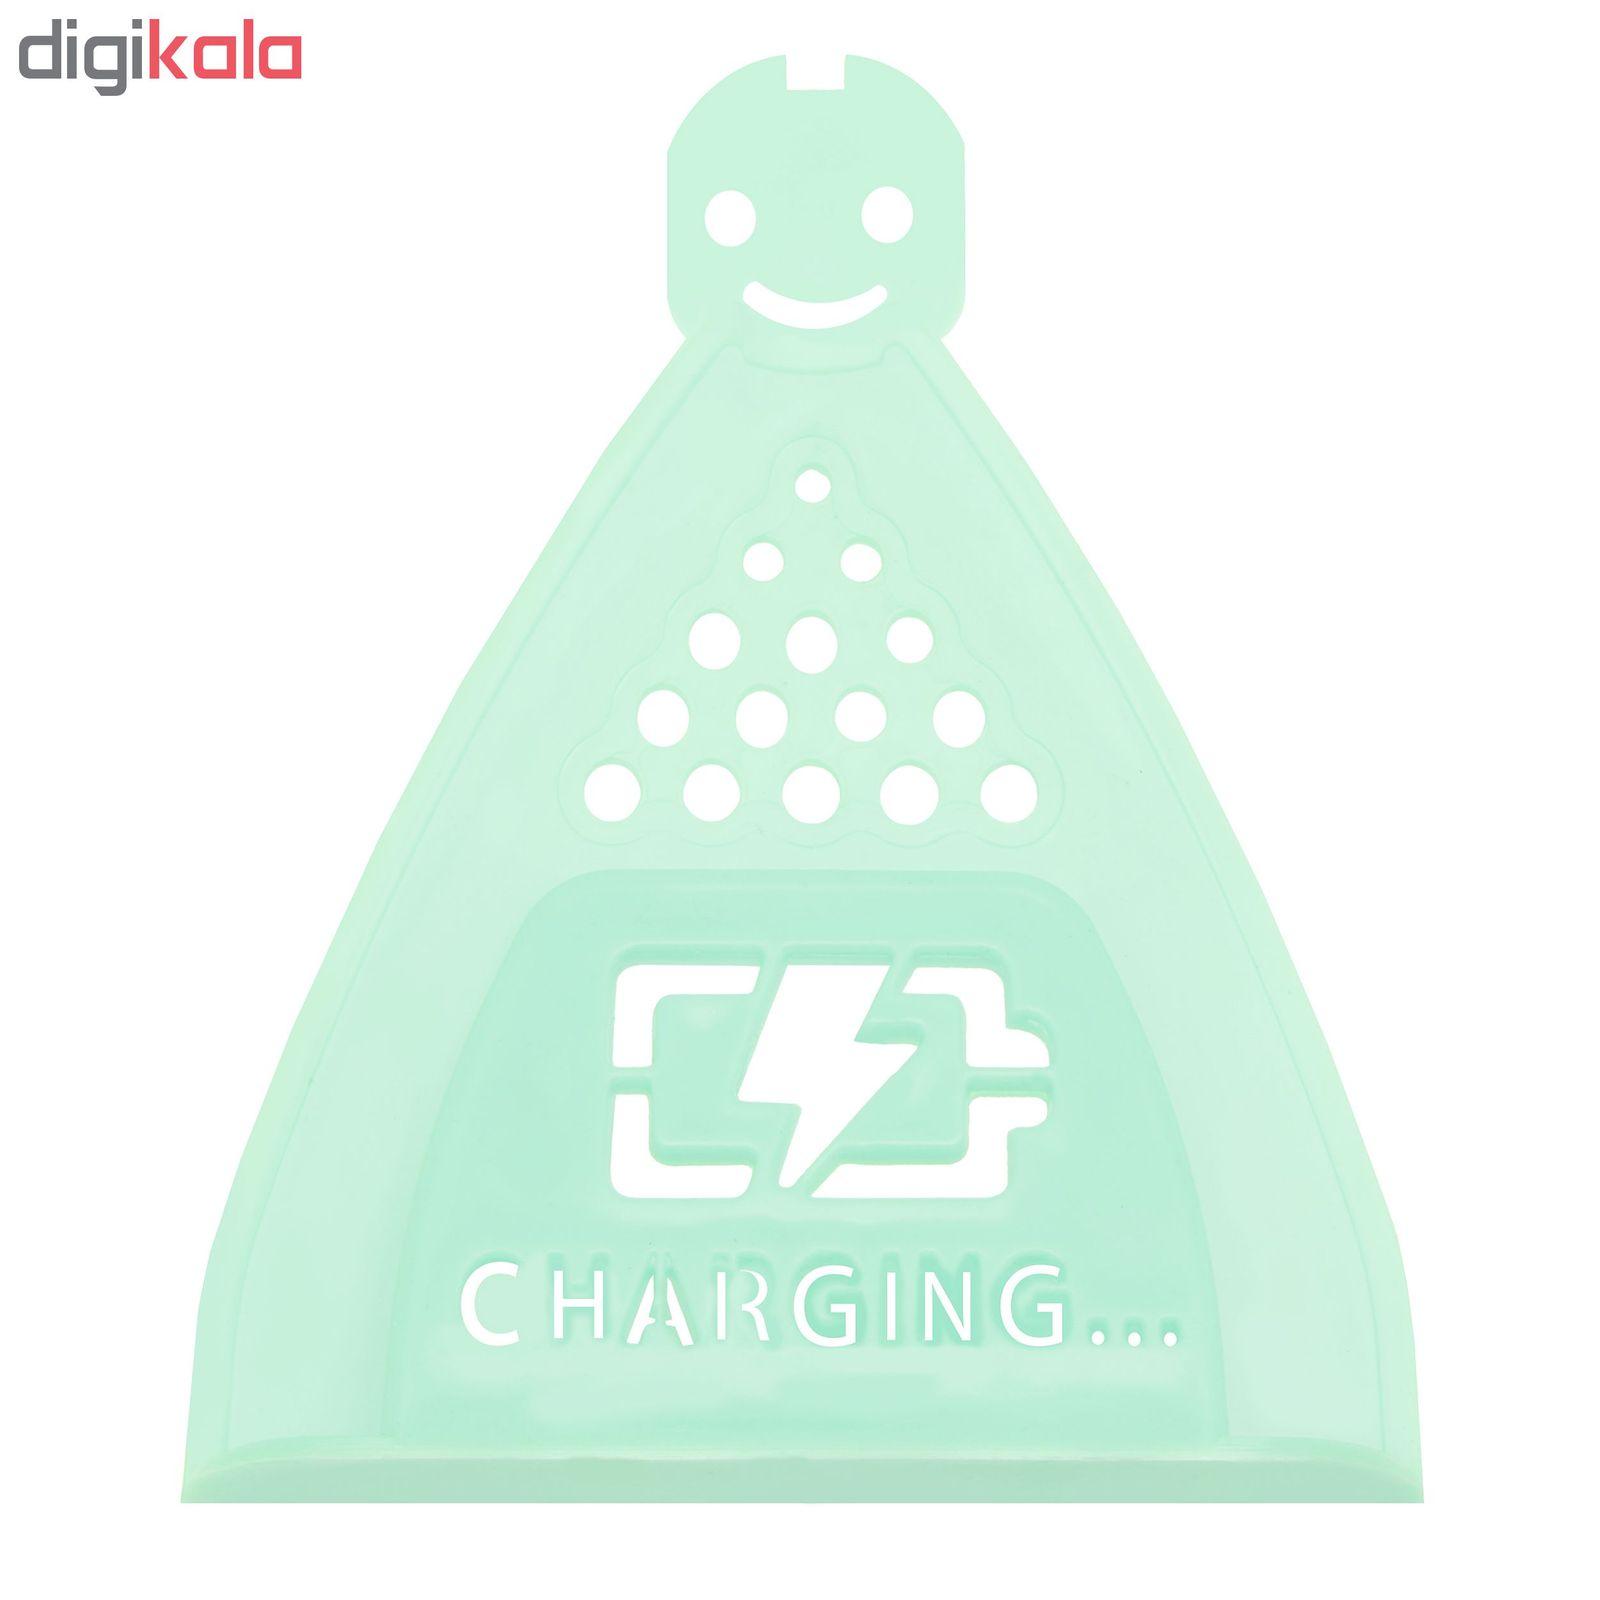 پایه نگهدارنده شارژر موبایل مدل Hng 0229 main 1 13